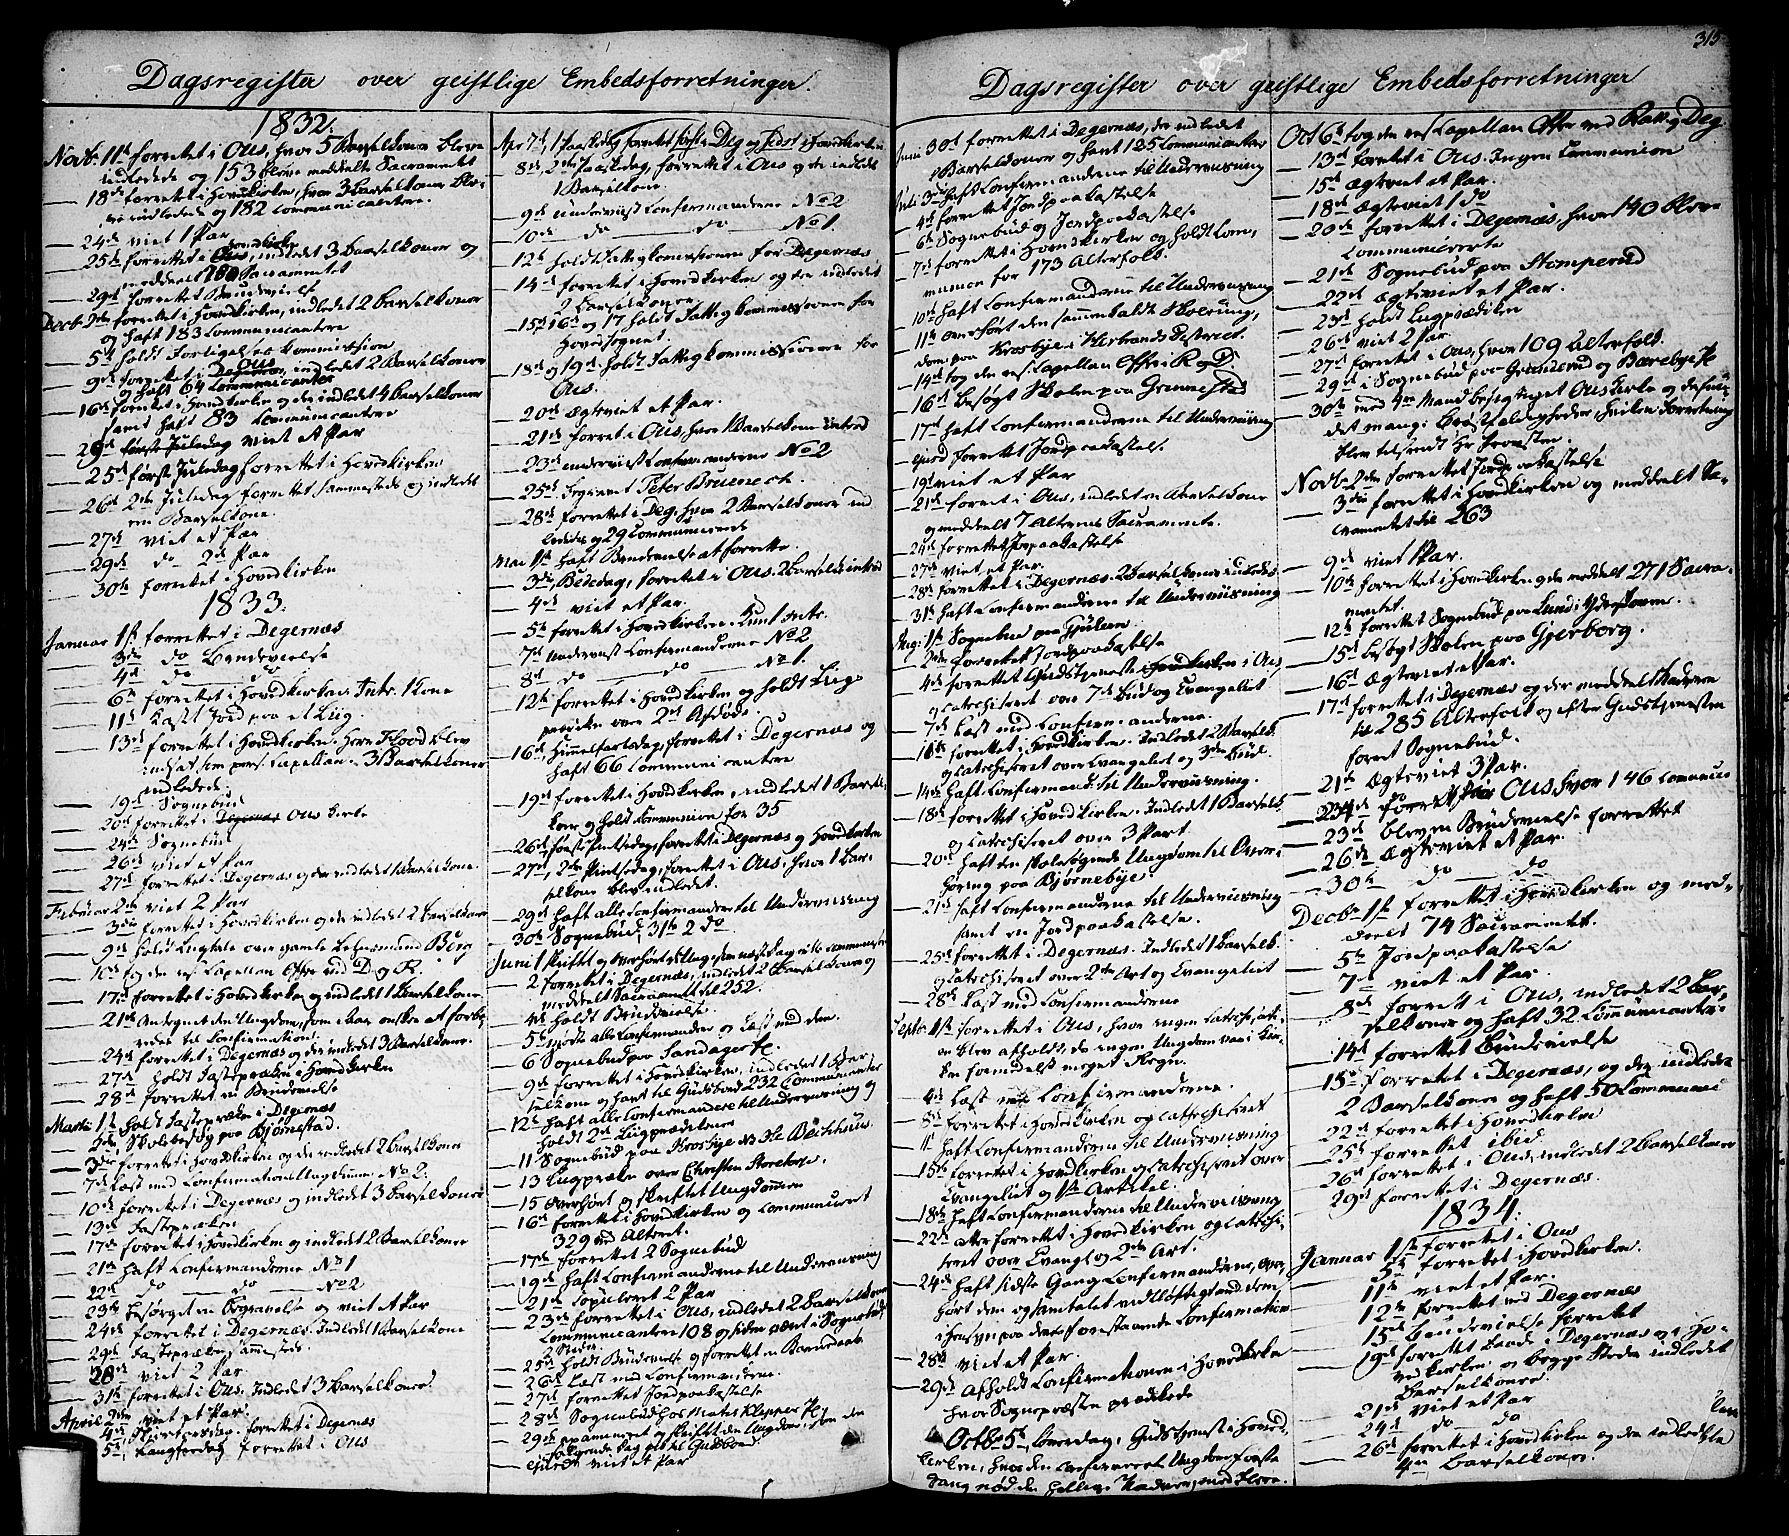 SAO, Rakkestad prestekontor Kirkebøker, F/Fa/L0007: Ministerialbok nr. I 7, 1825-1841, s. 315